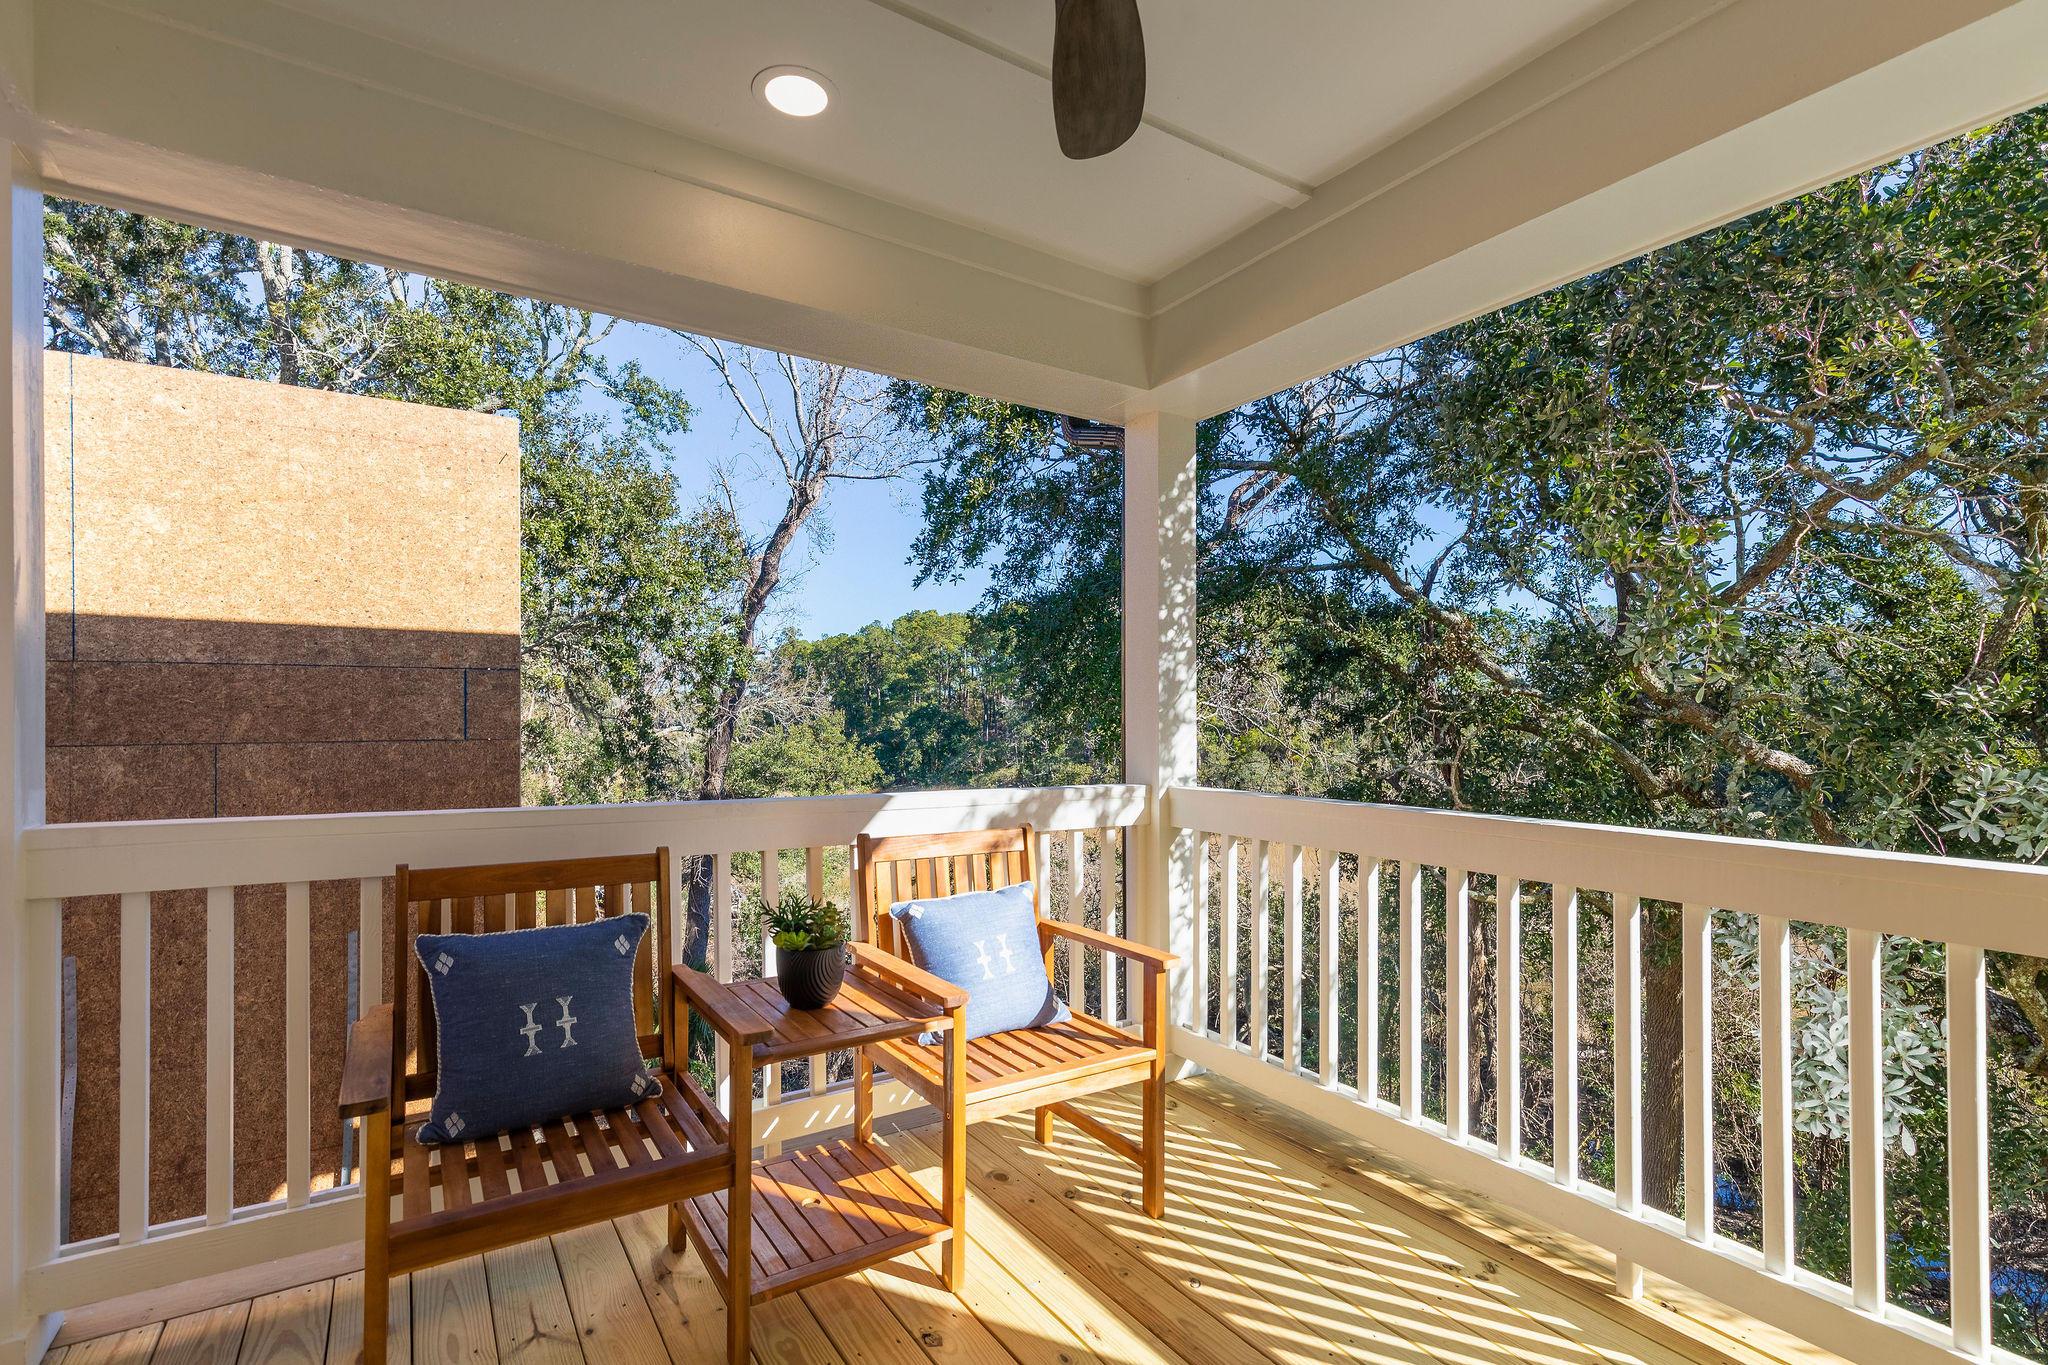 Avenue of Oaks Homes For Sale - 1027 Avenue Of Oaks, Charleston, SC - 11